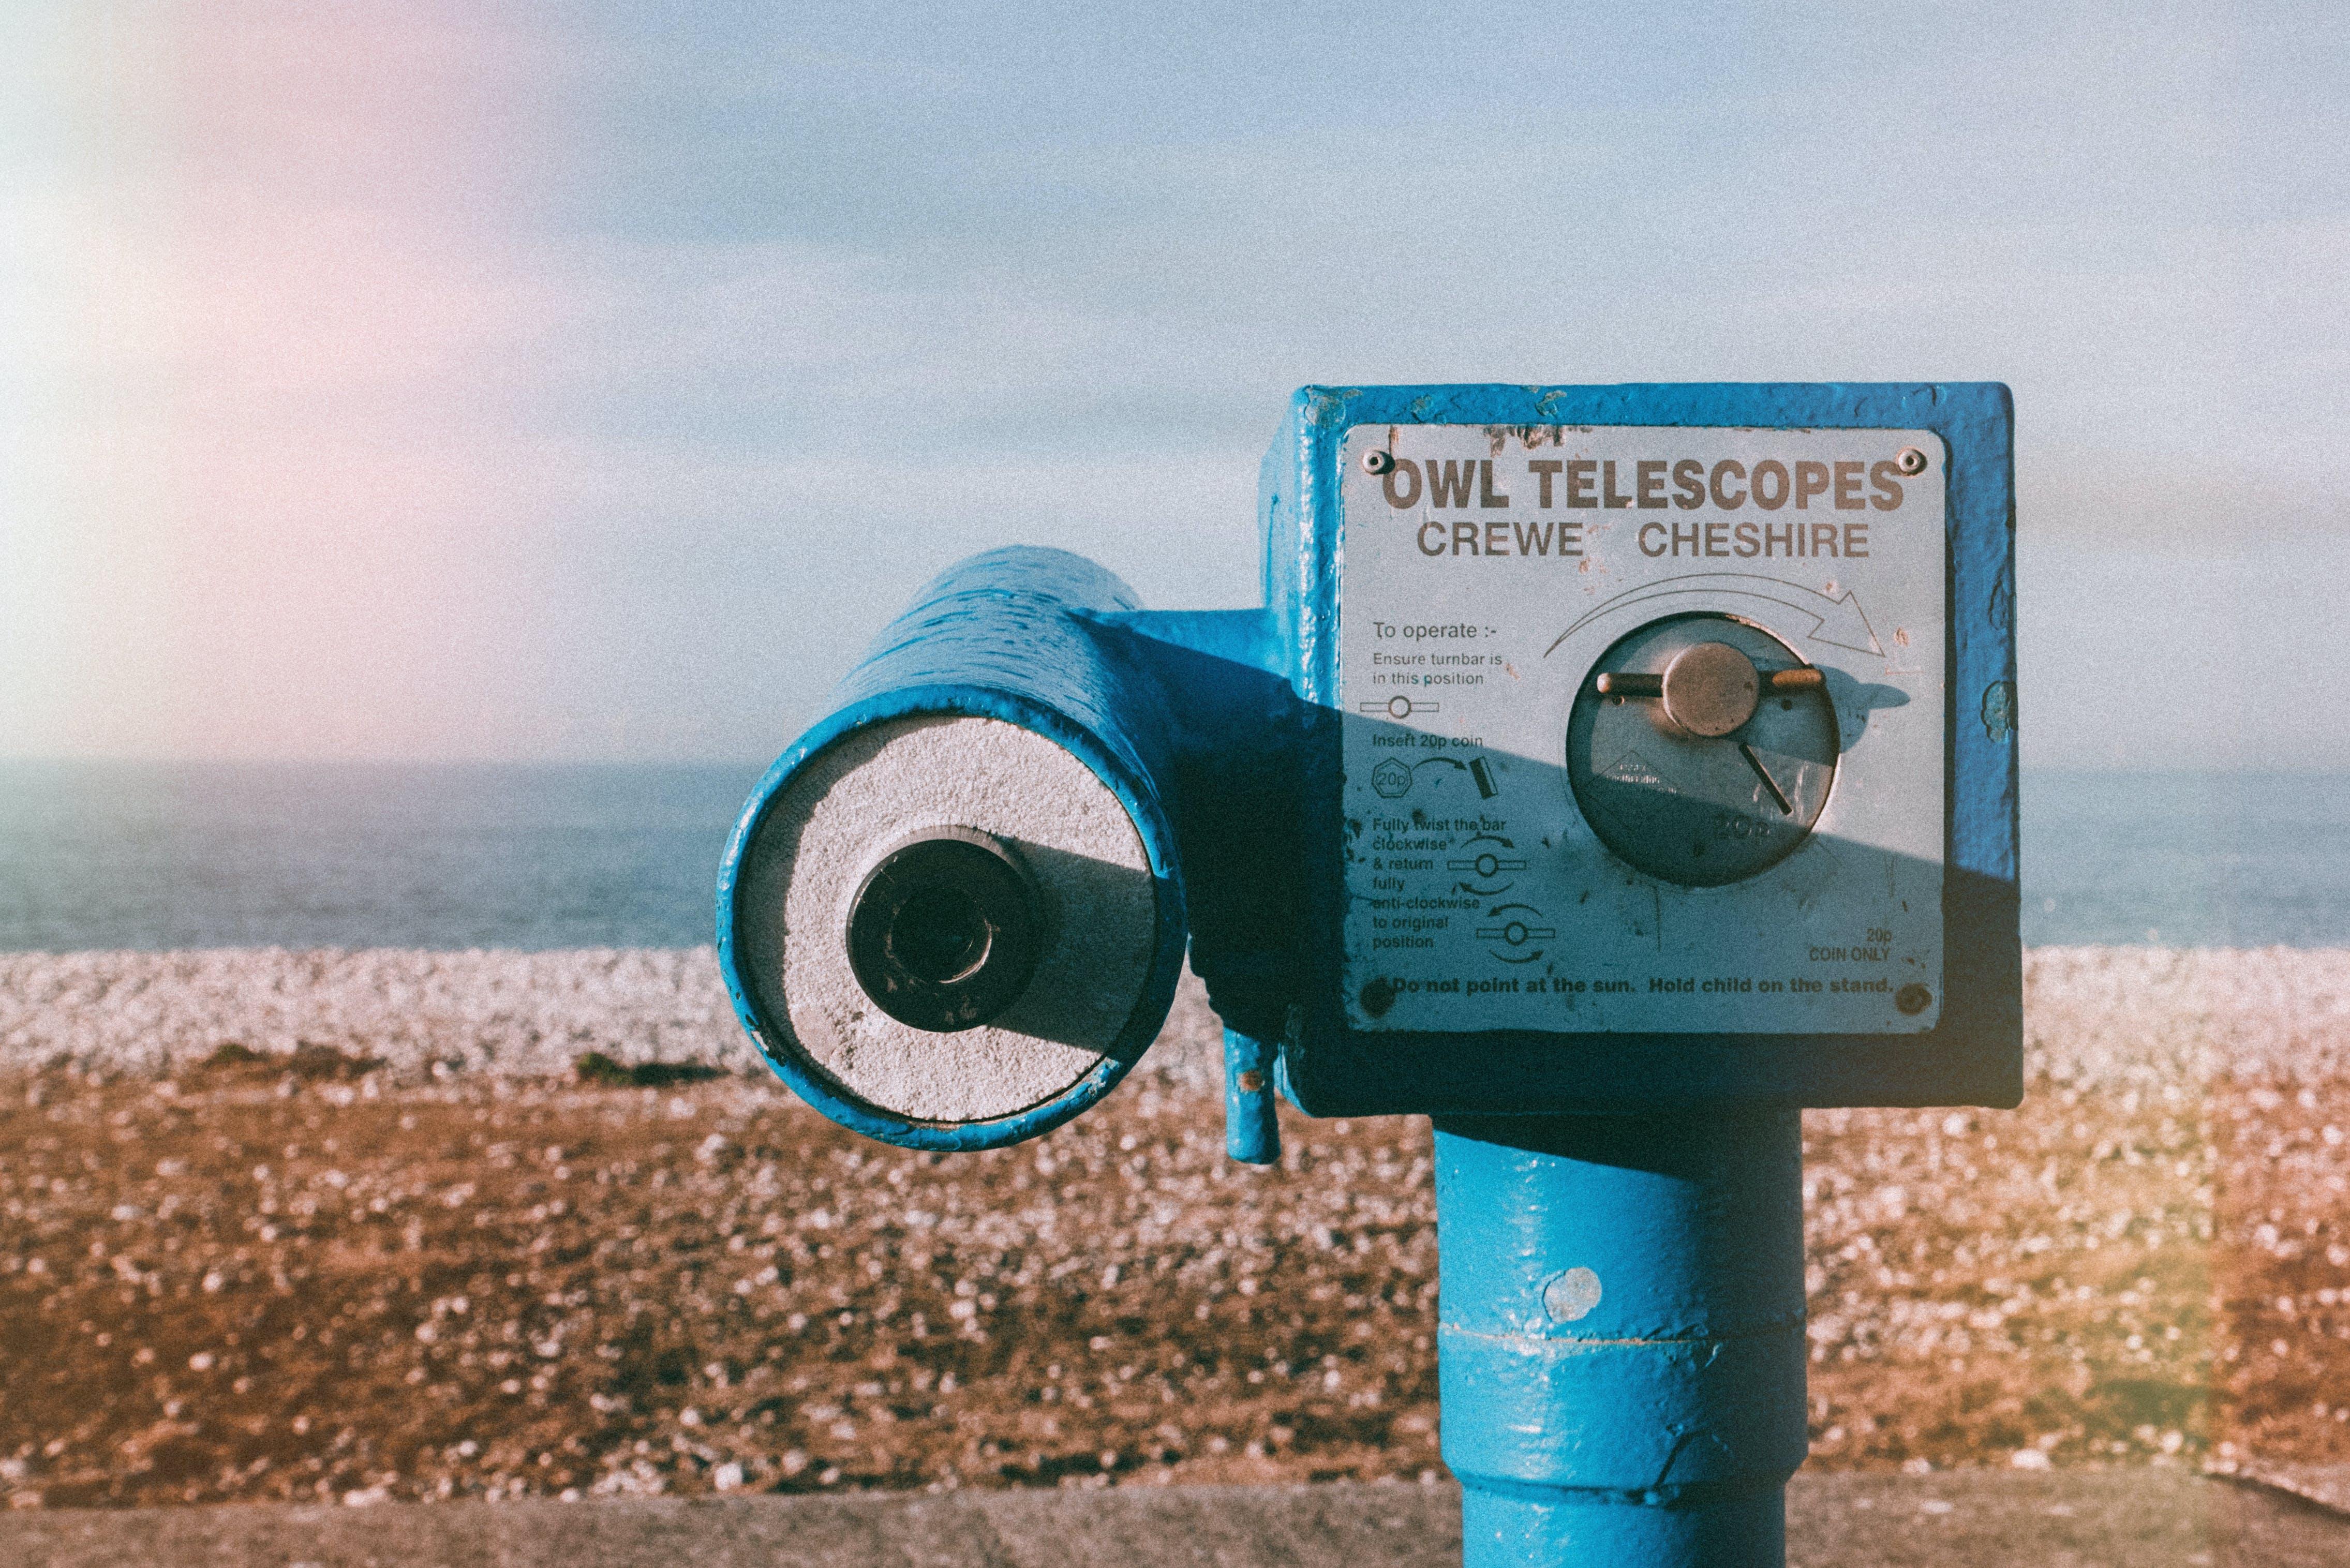 Selective Focus Photography of Blue Owl Telescopes